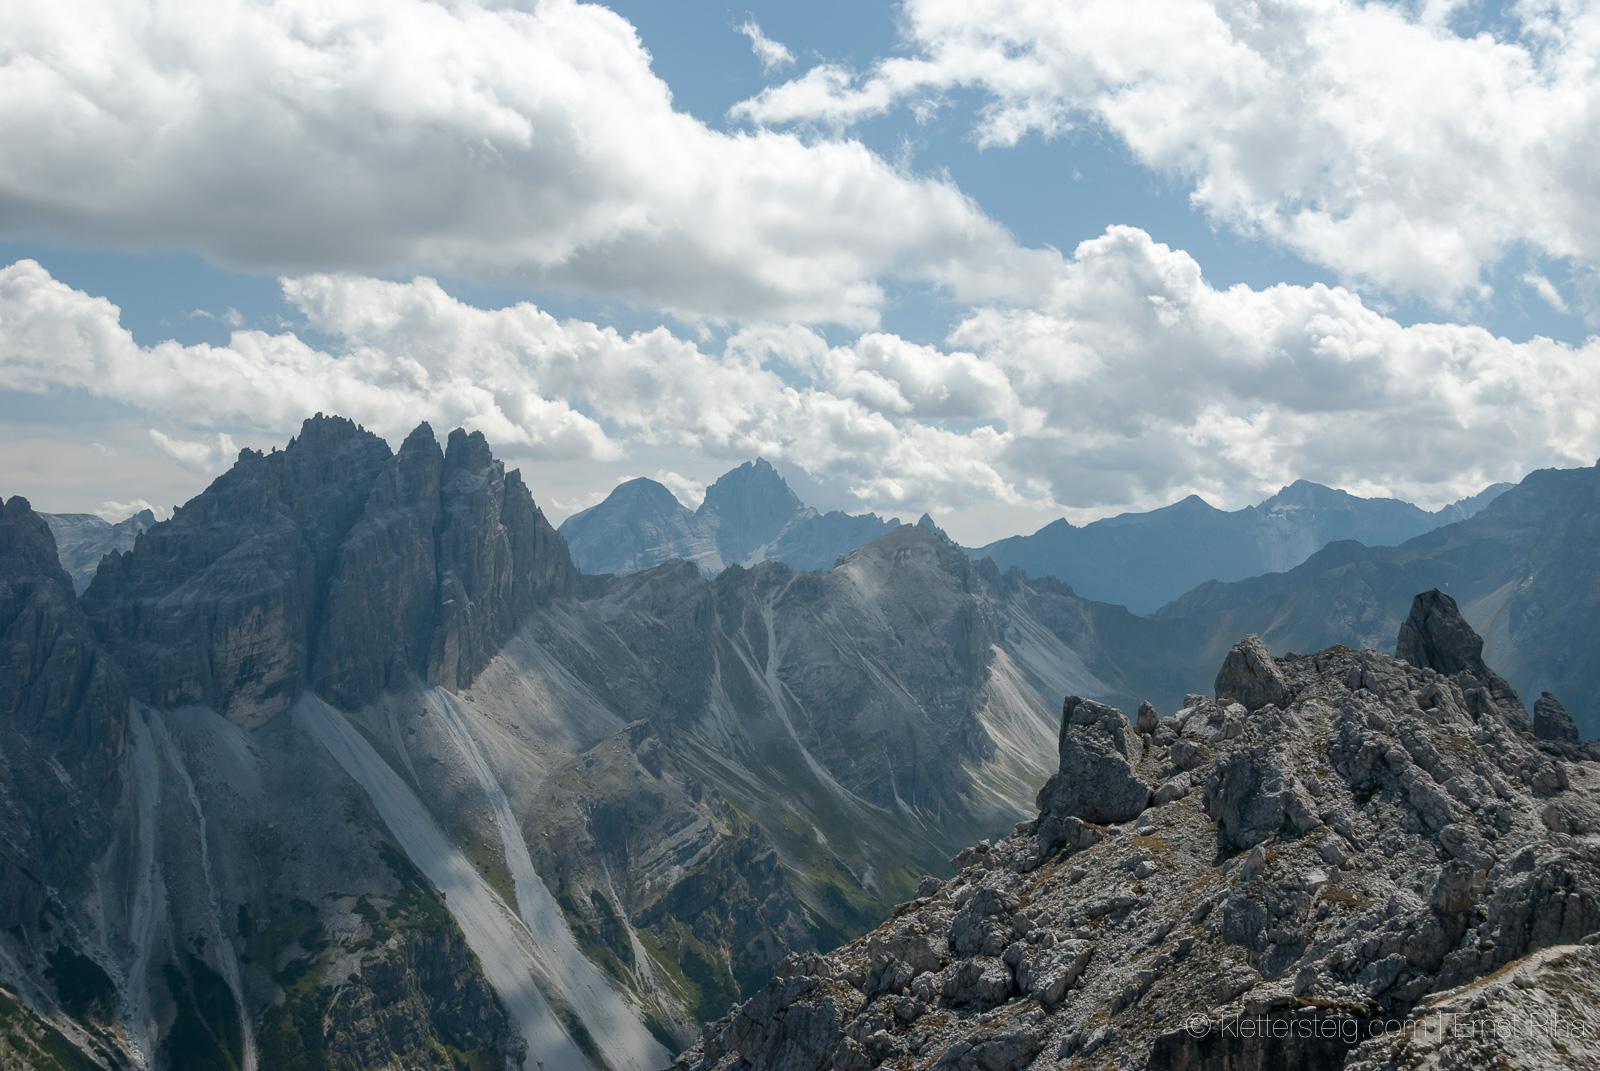 Elfer Klettersteig, Neustift, Stubai, Tirol, 25. August 2007